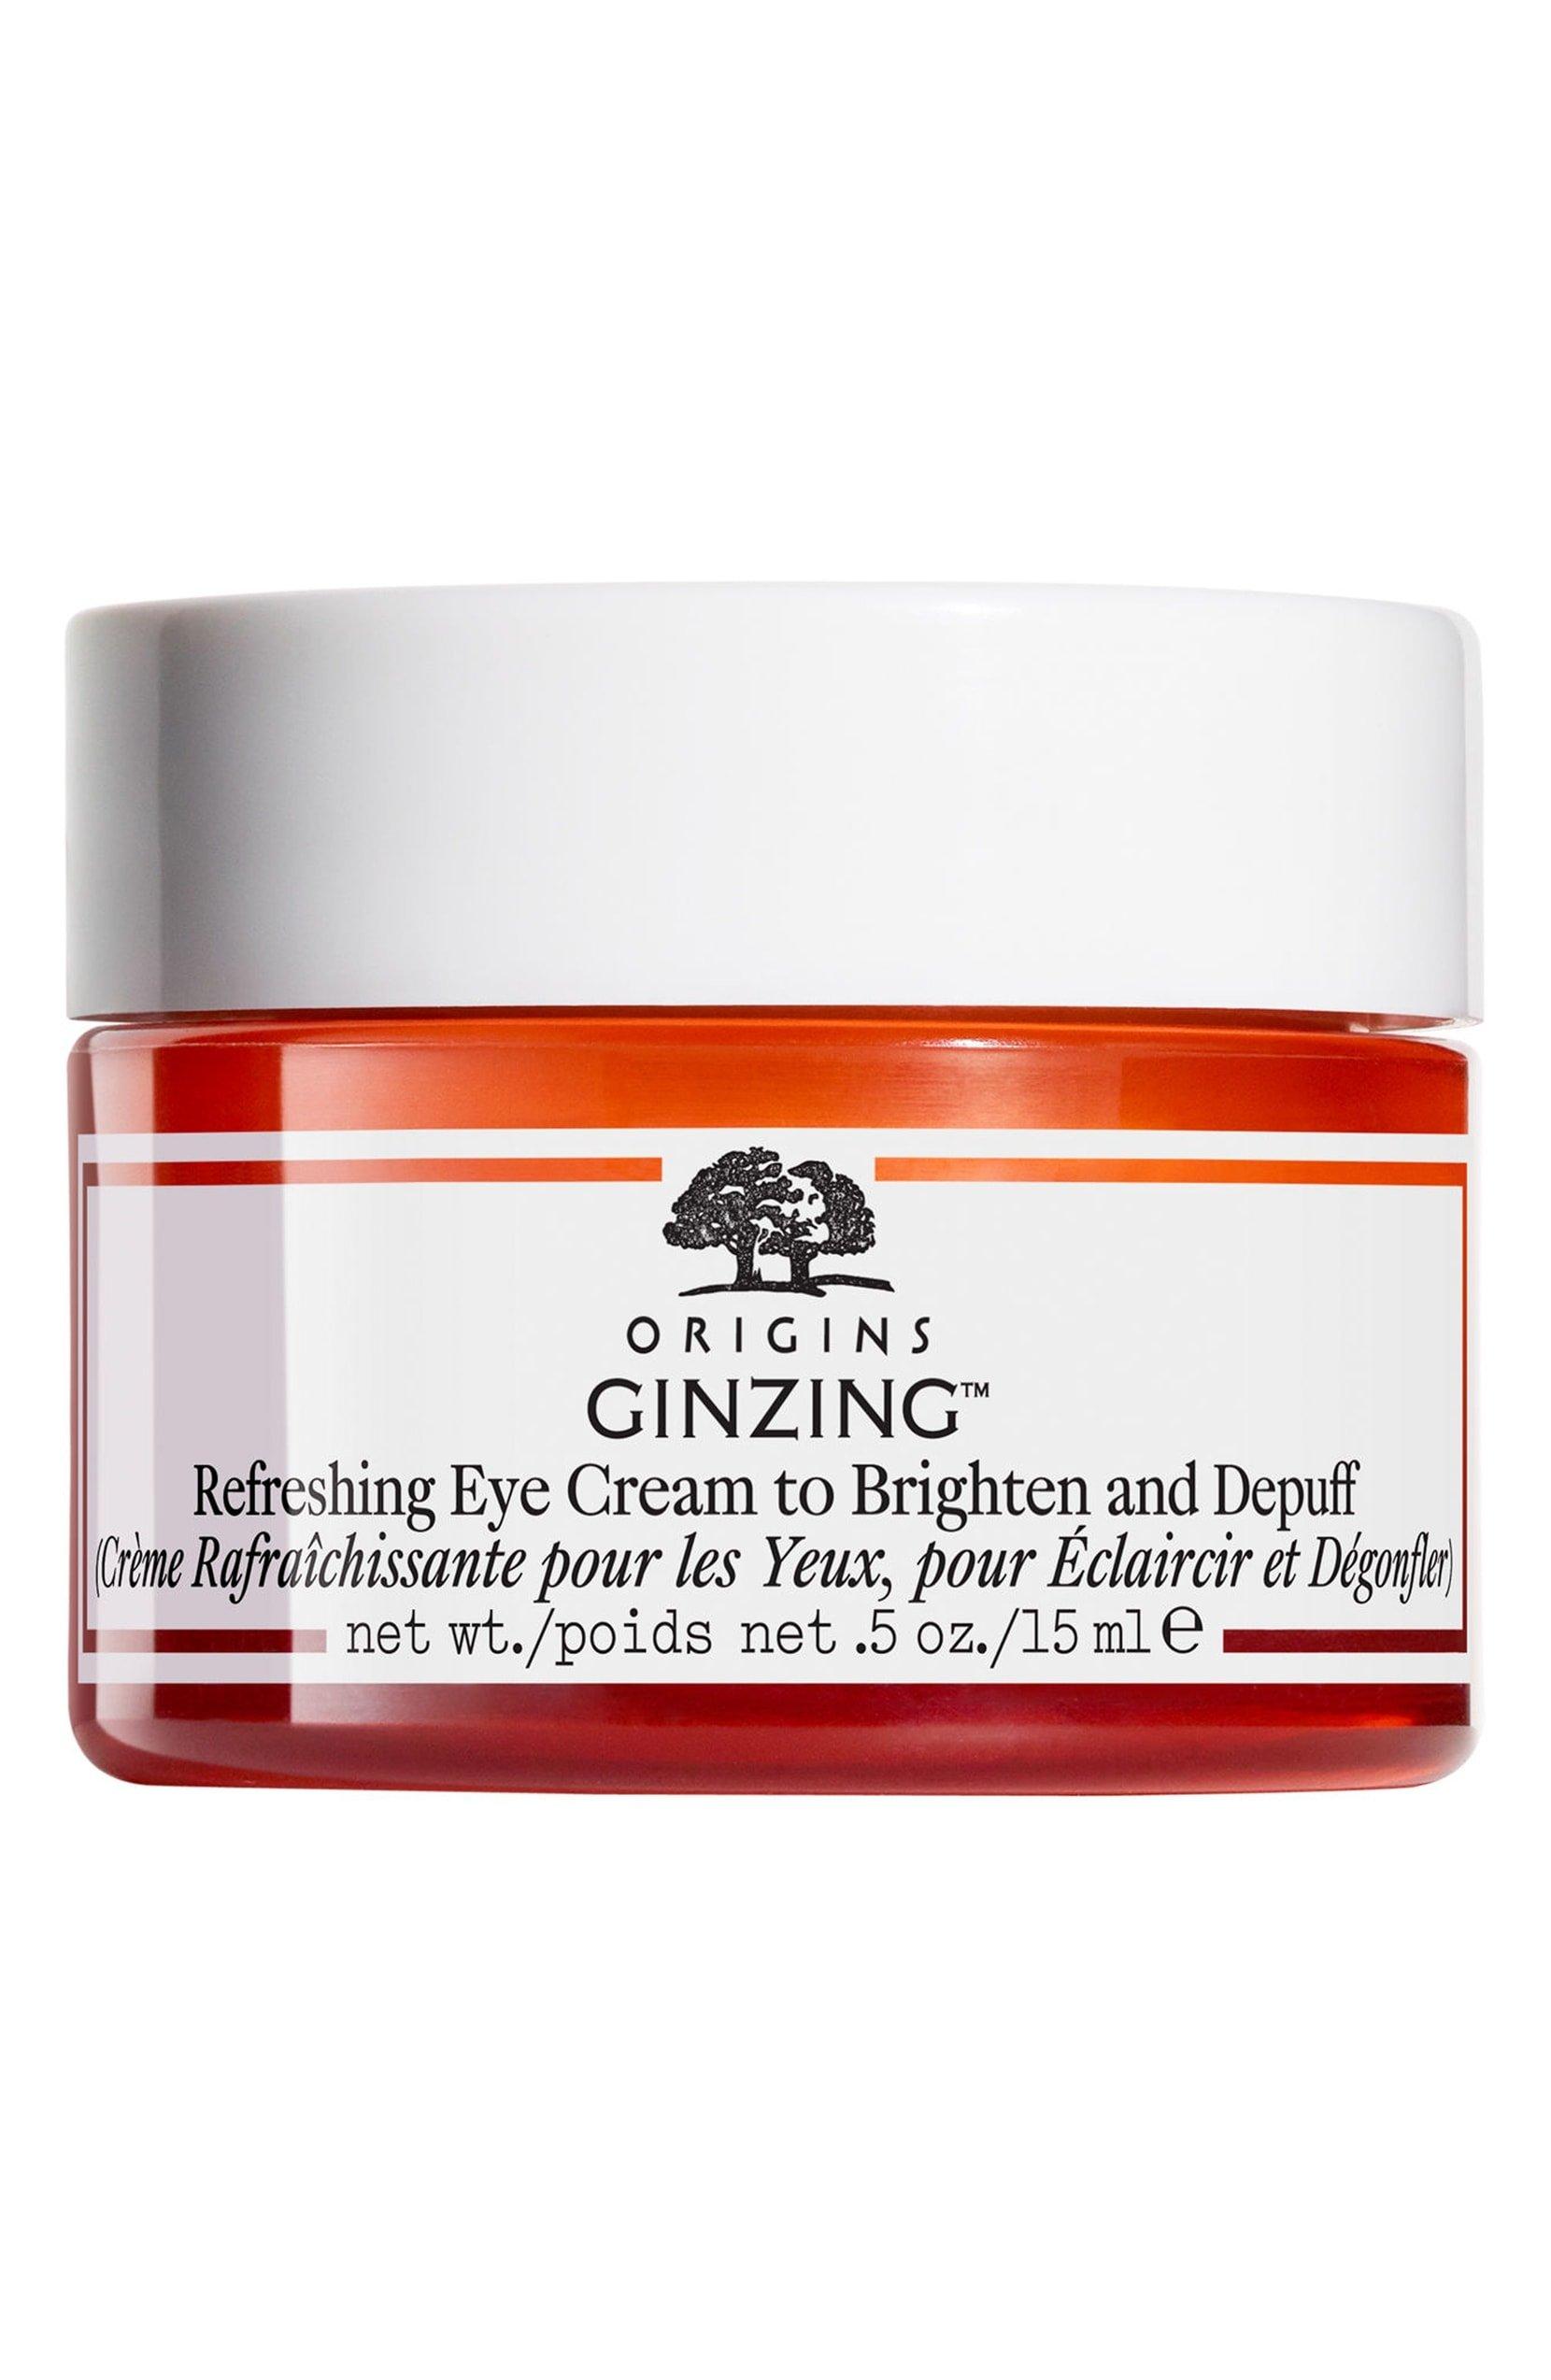 Origins Ginzing Refreshing Eye Cream To Brighten and Depuff By Origins for Unisex - 0.5 Oz Eye Cream, 0.5 Ounce